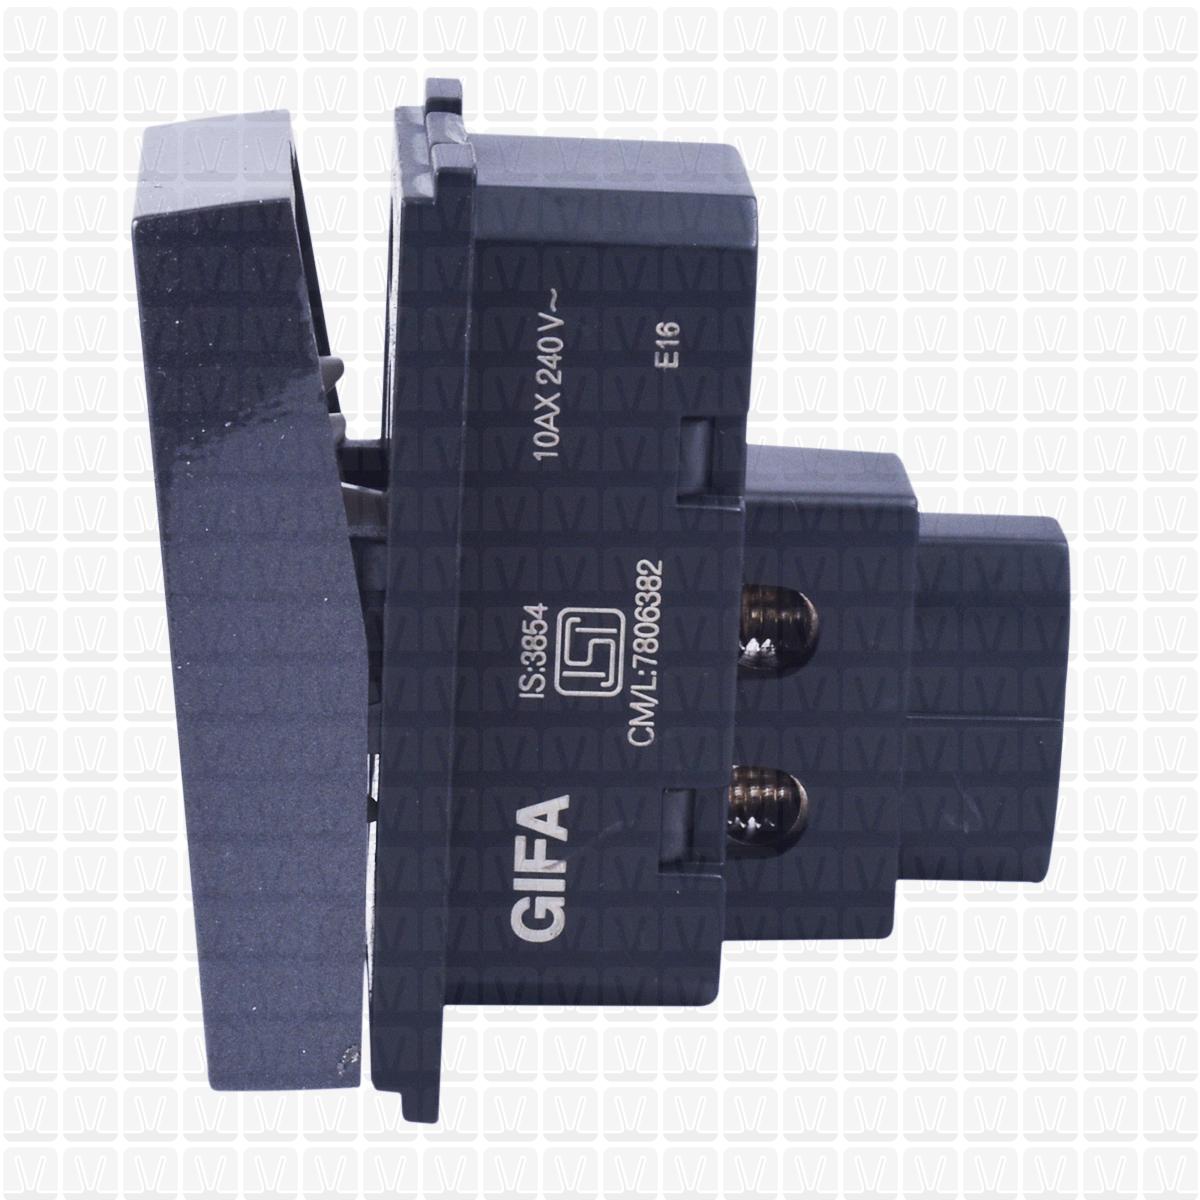 Gifa Grey One Way Switch 10 Amp Vardhman Shop Circuit